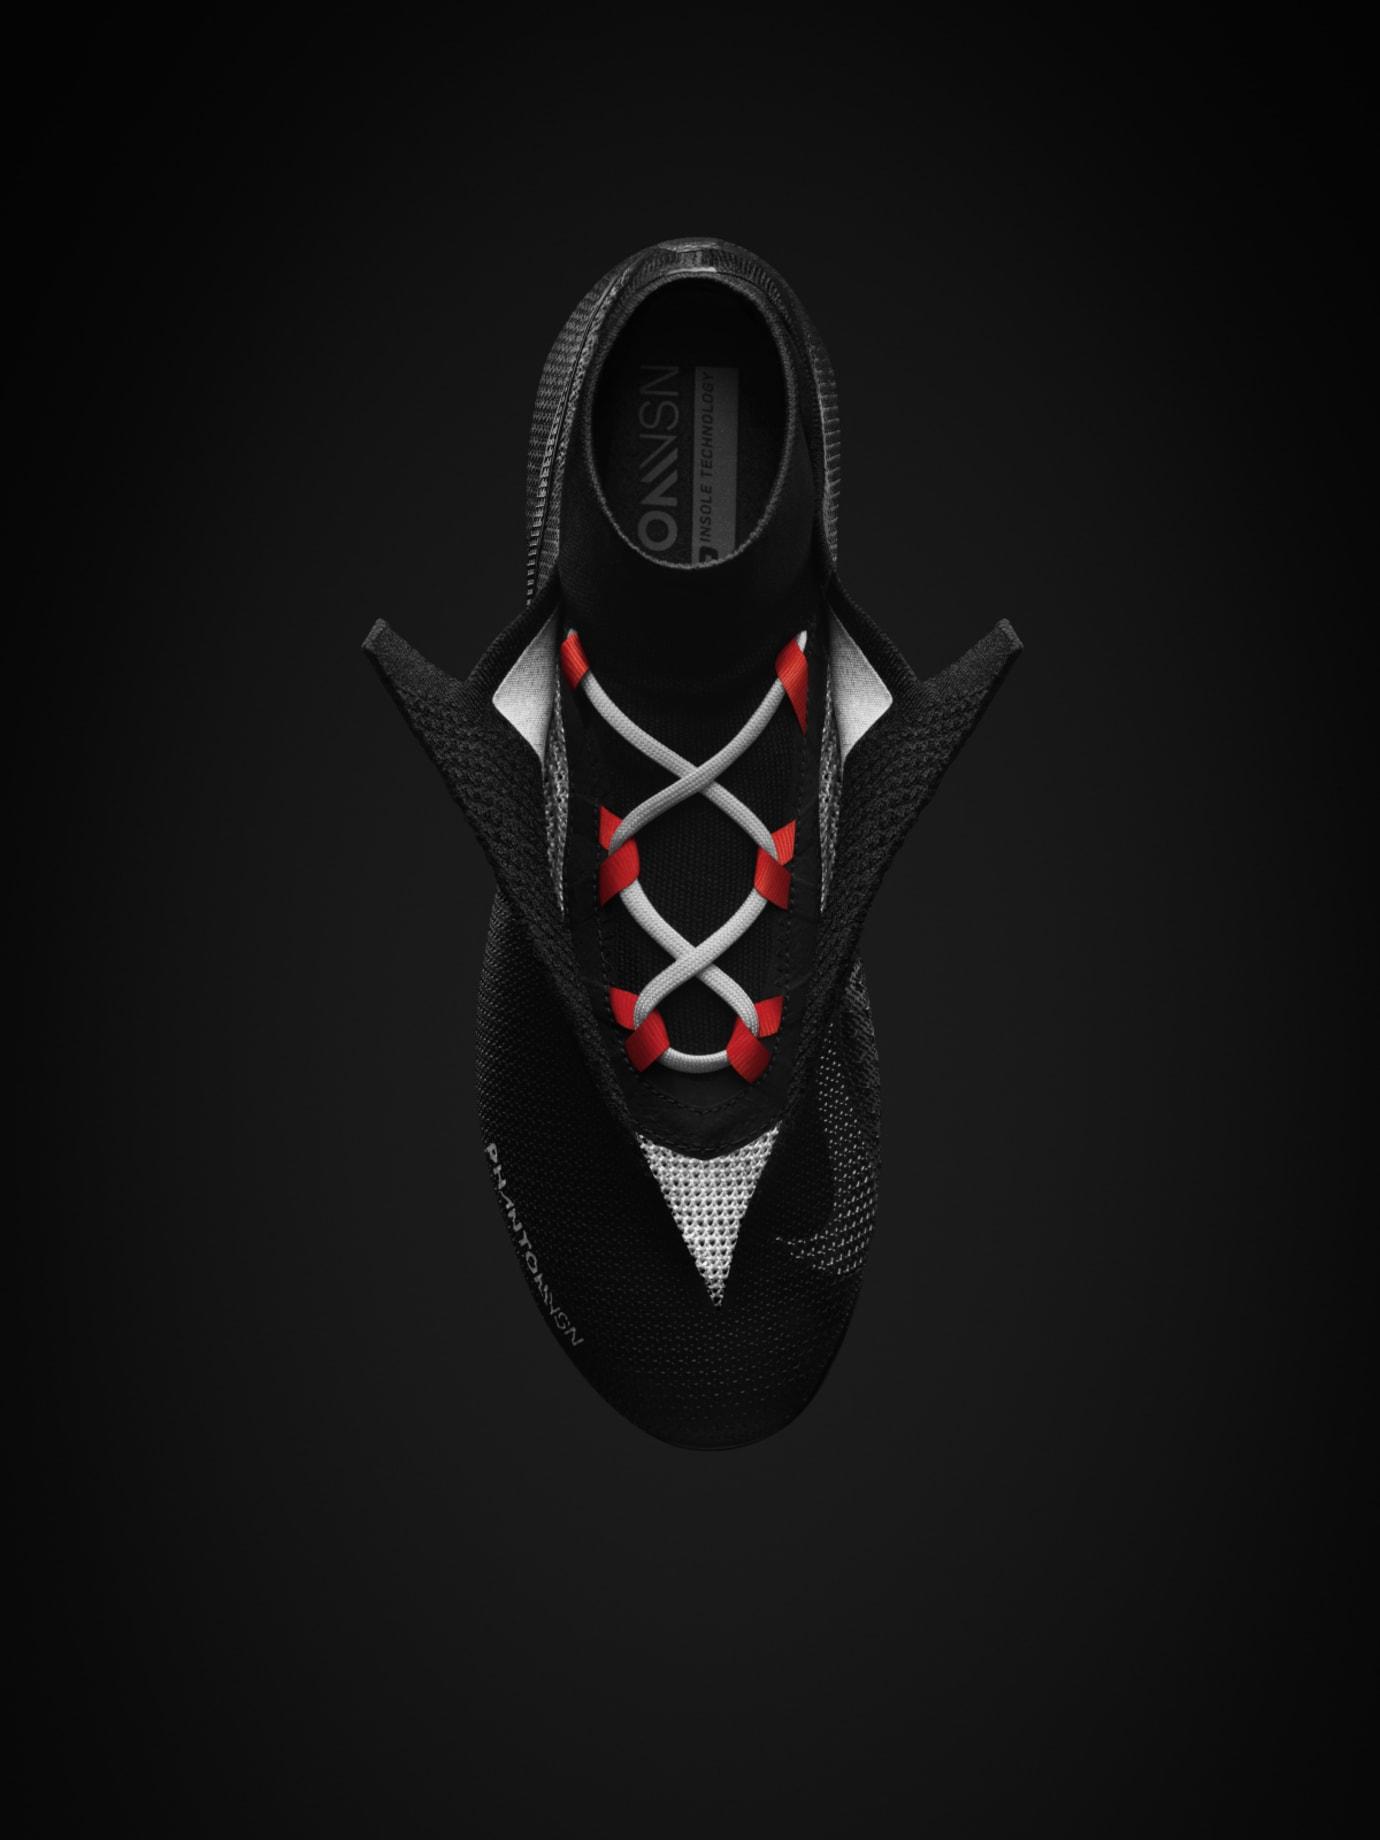 Nike PhantomVSN (Ghost Lace)